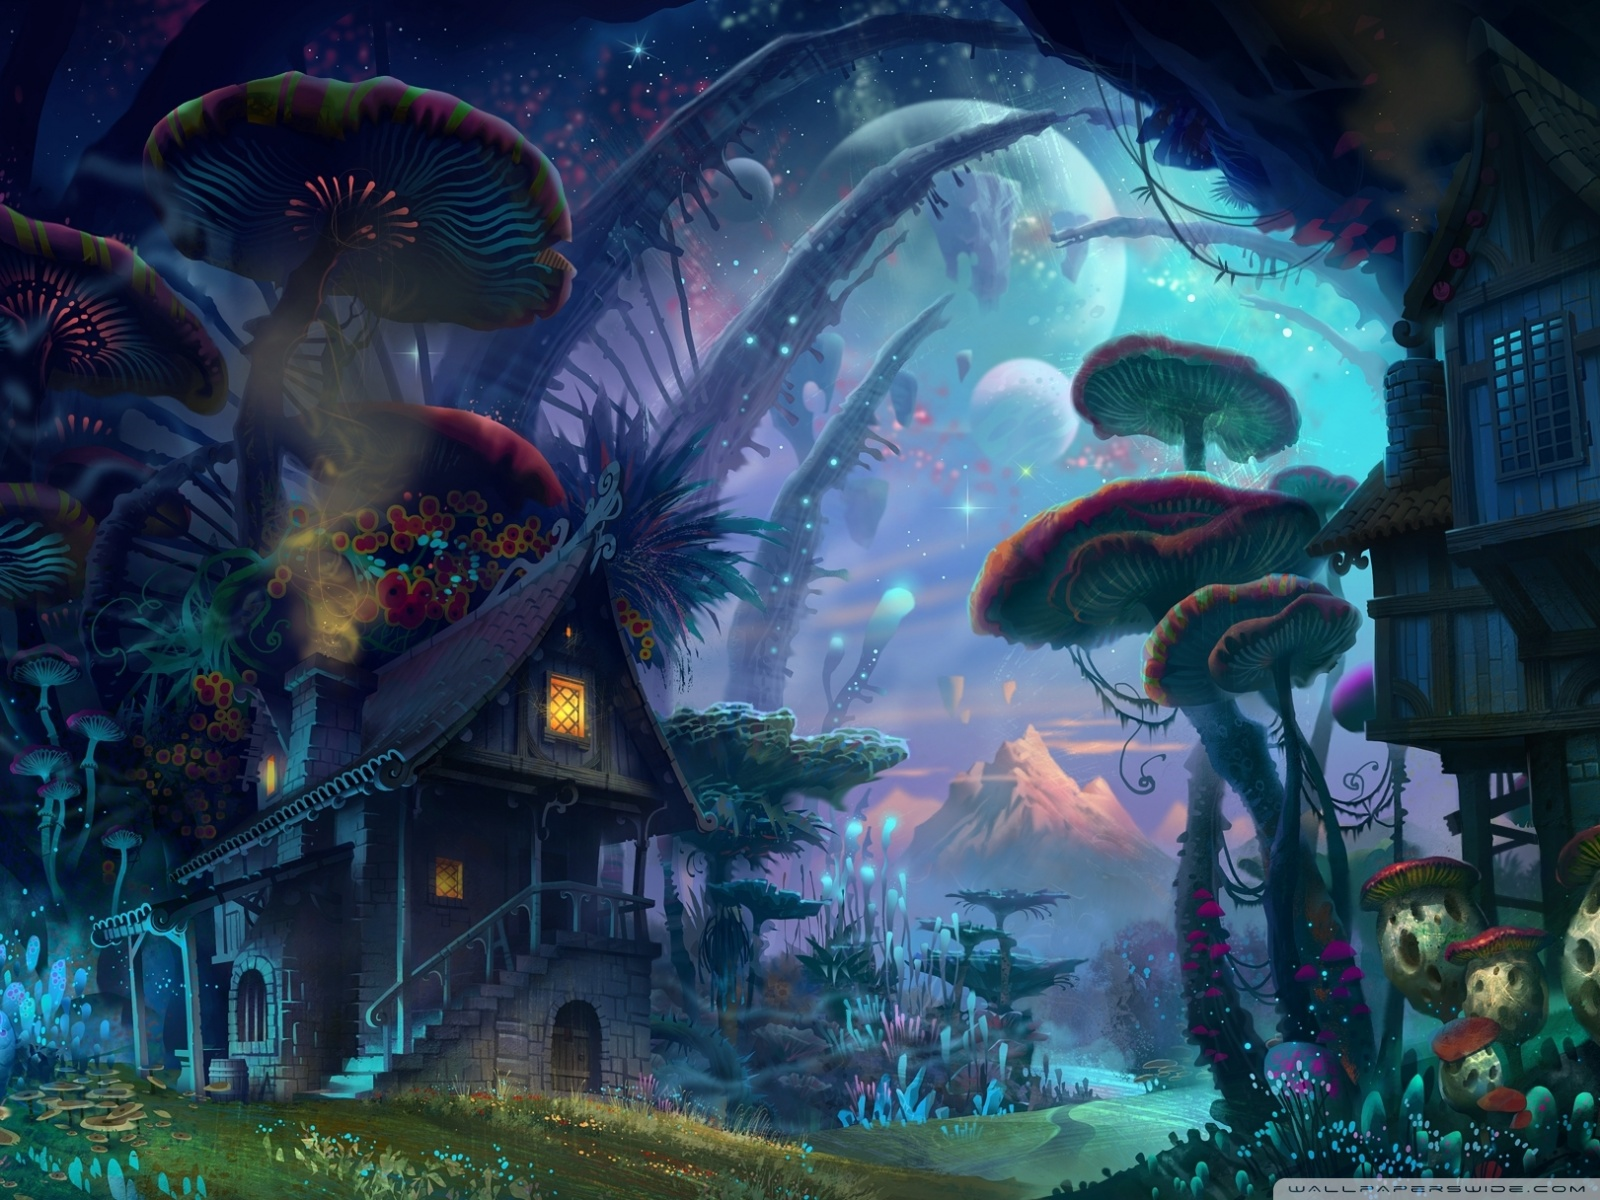 Fantasy Planet Art HD wallpaper 2157651 1600x1200